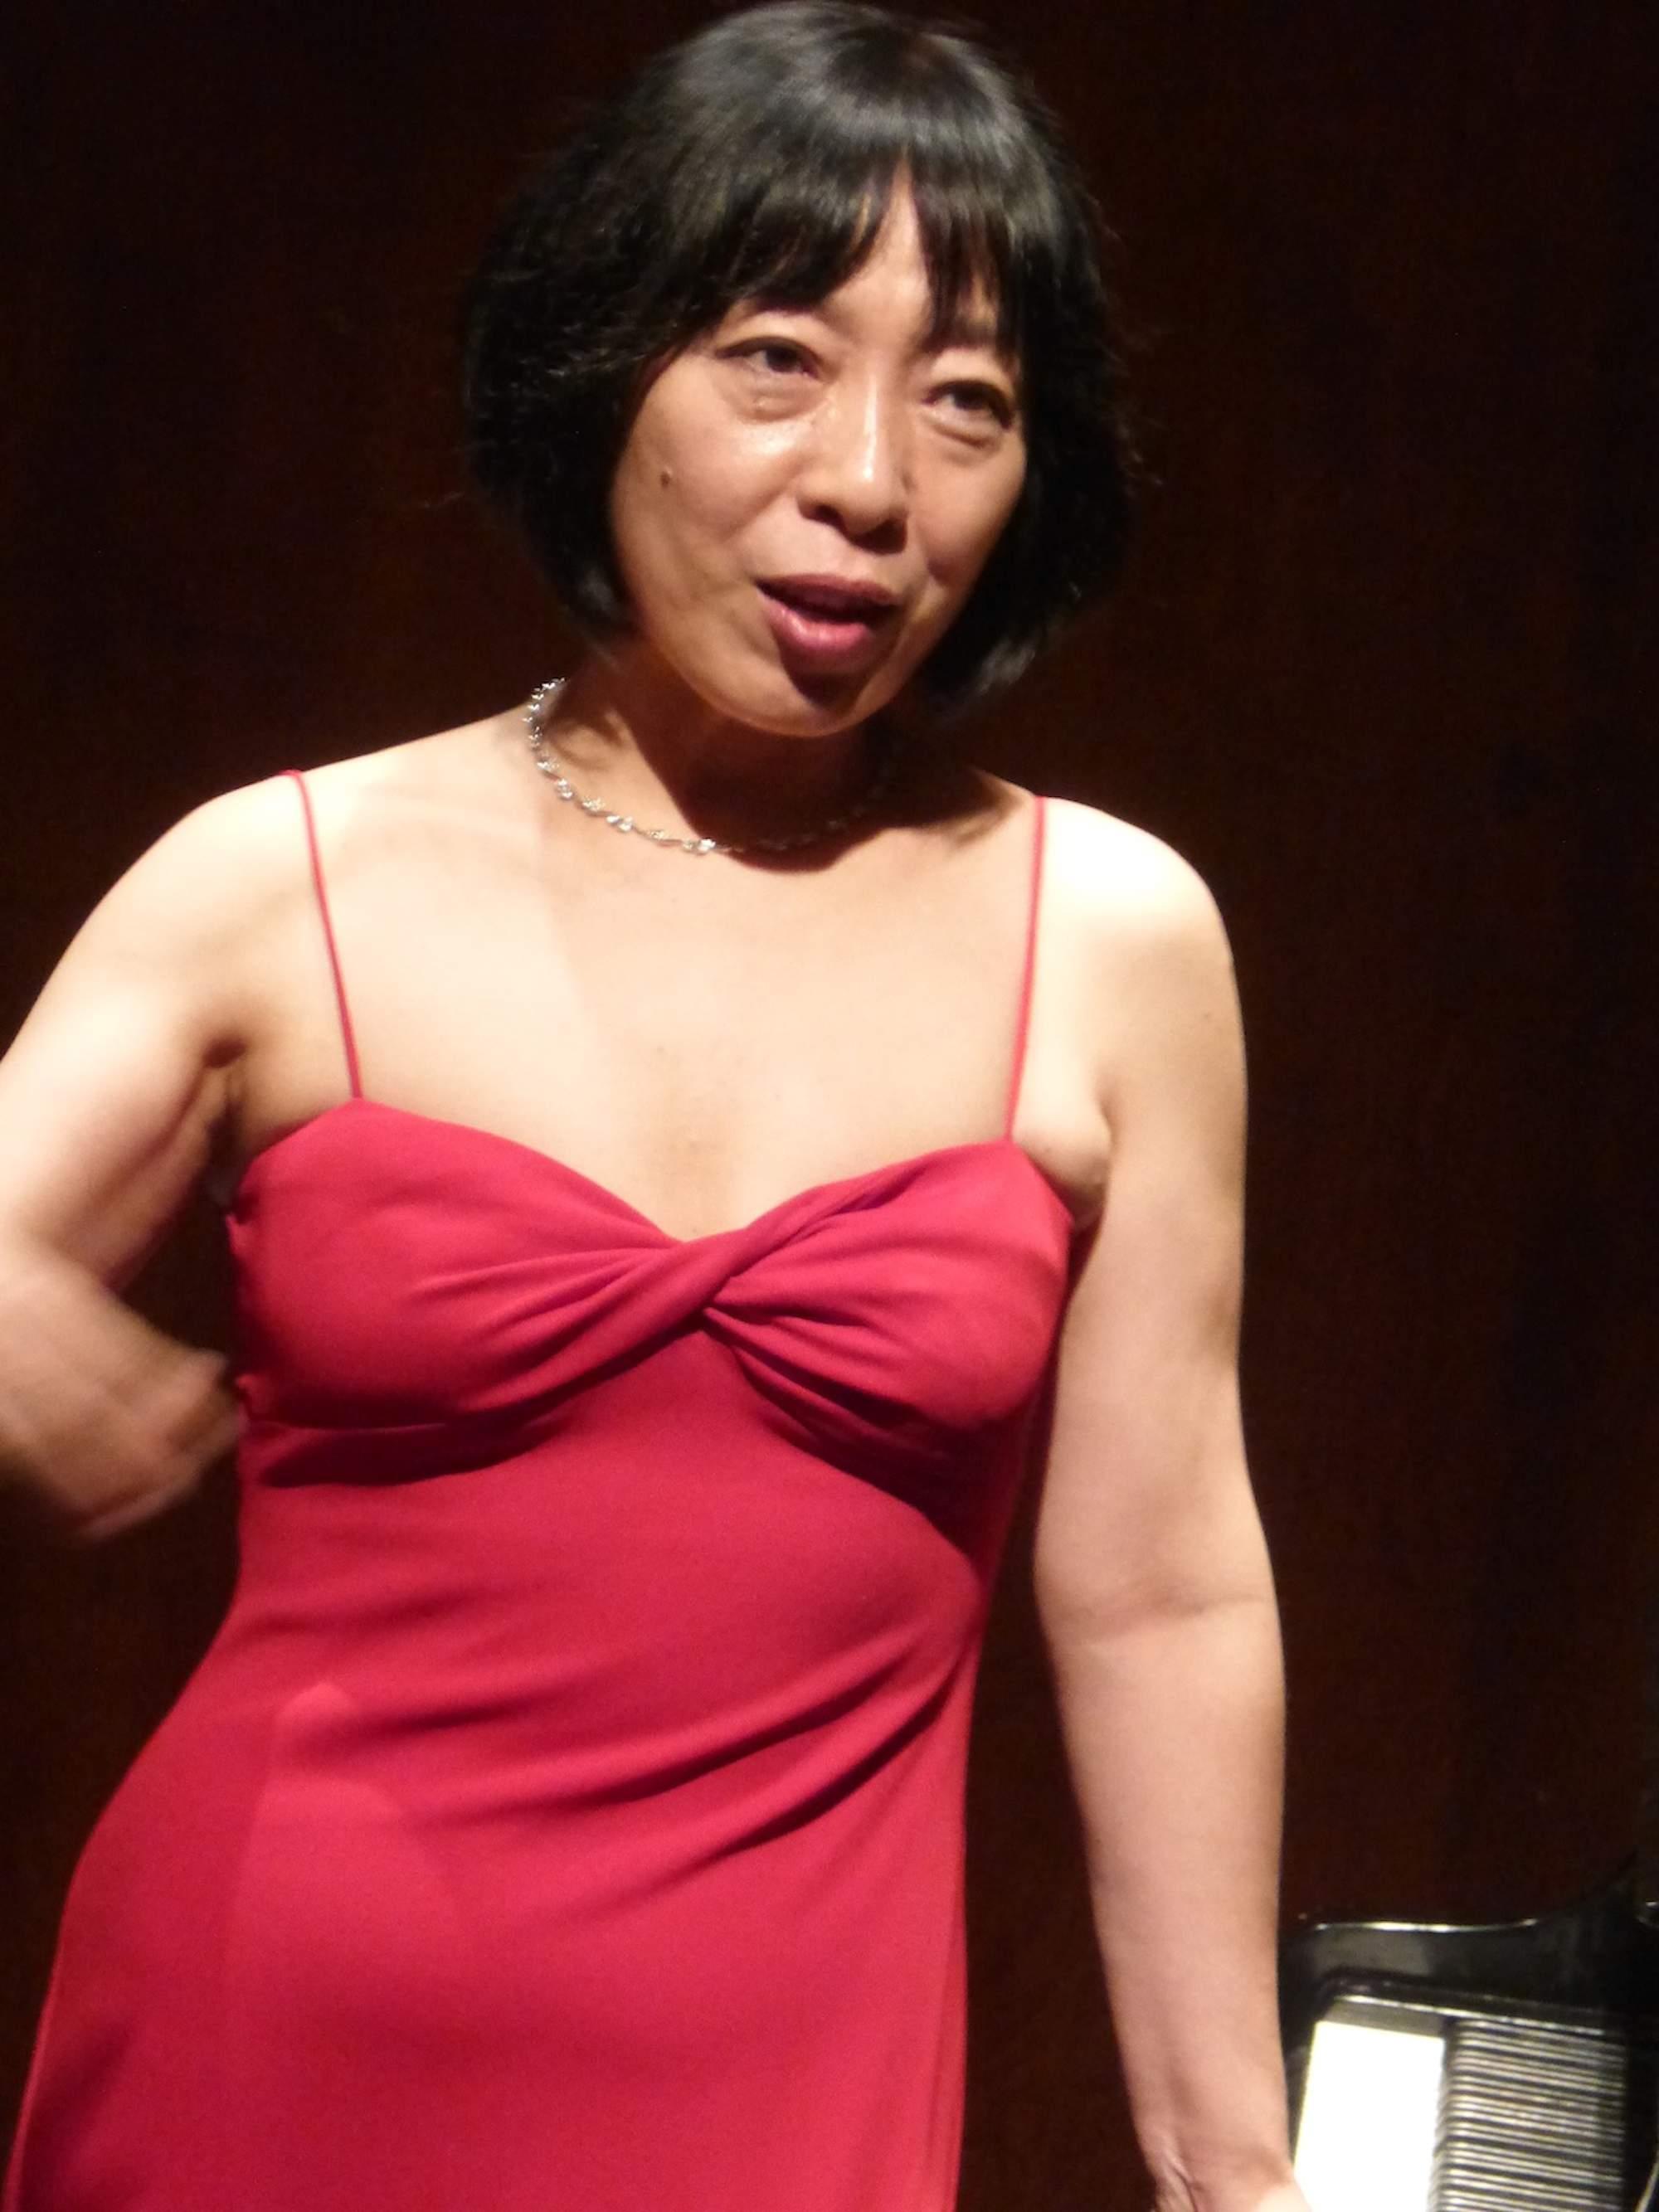 Haysun Kang, pianist, 9:23:14